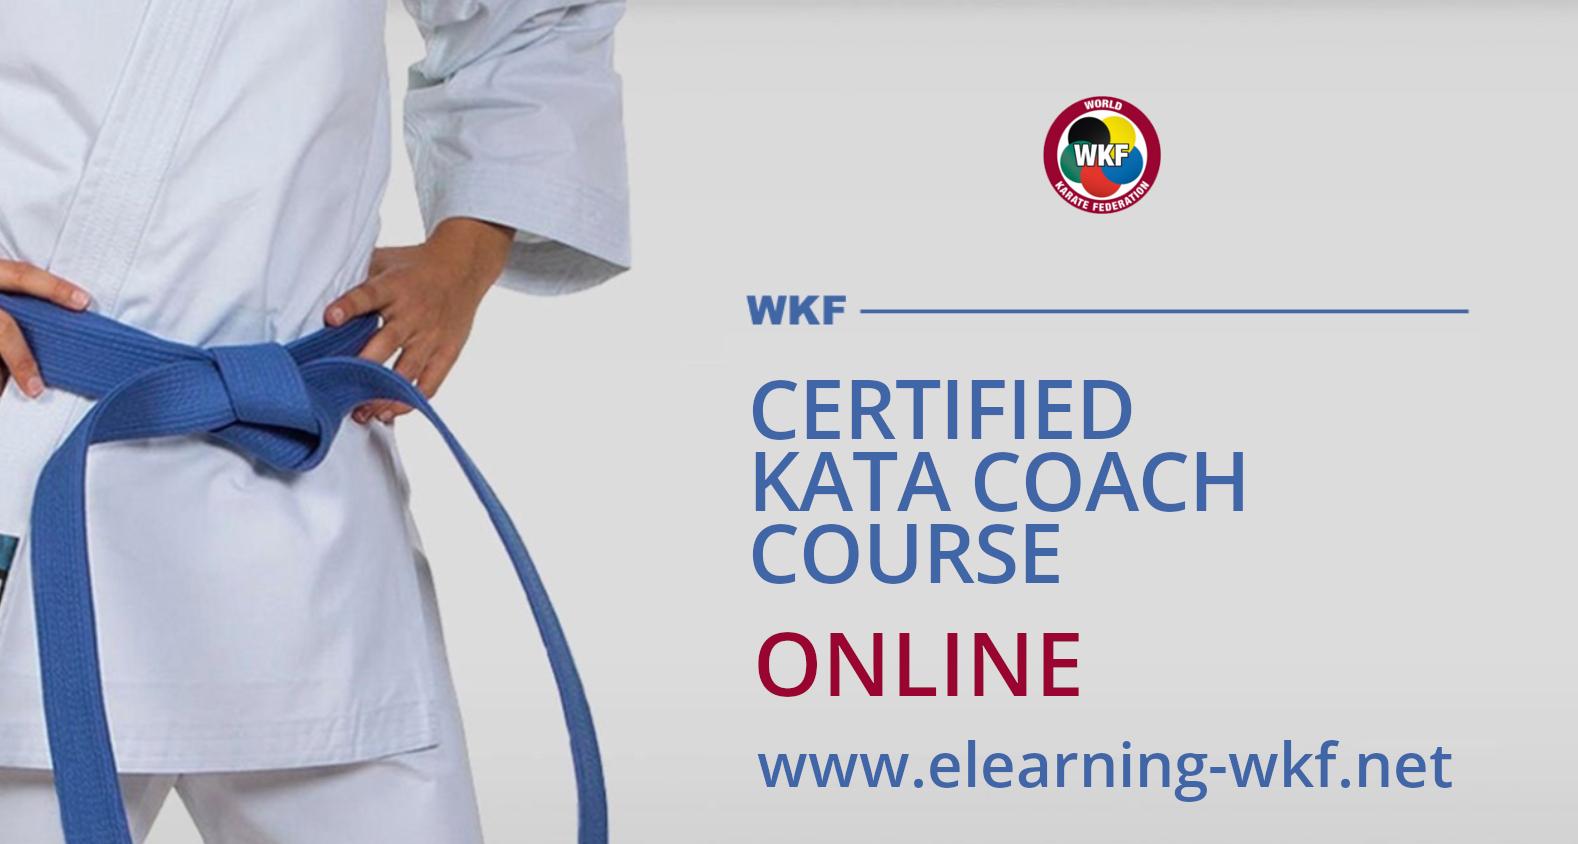 WKF Certified Kata Coach Course